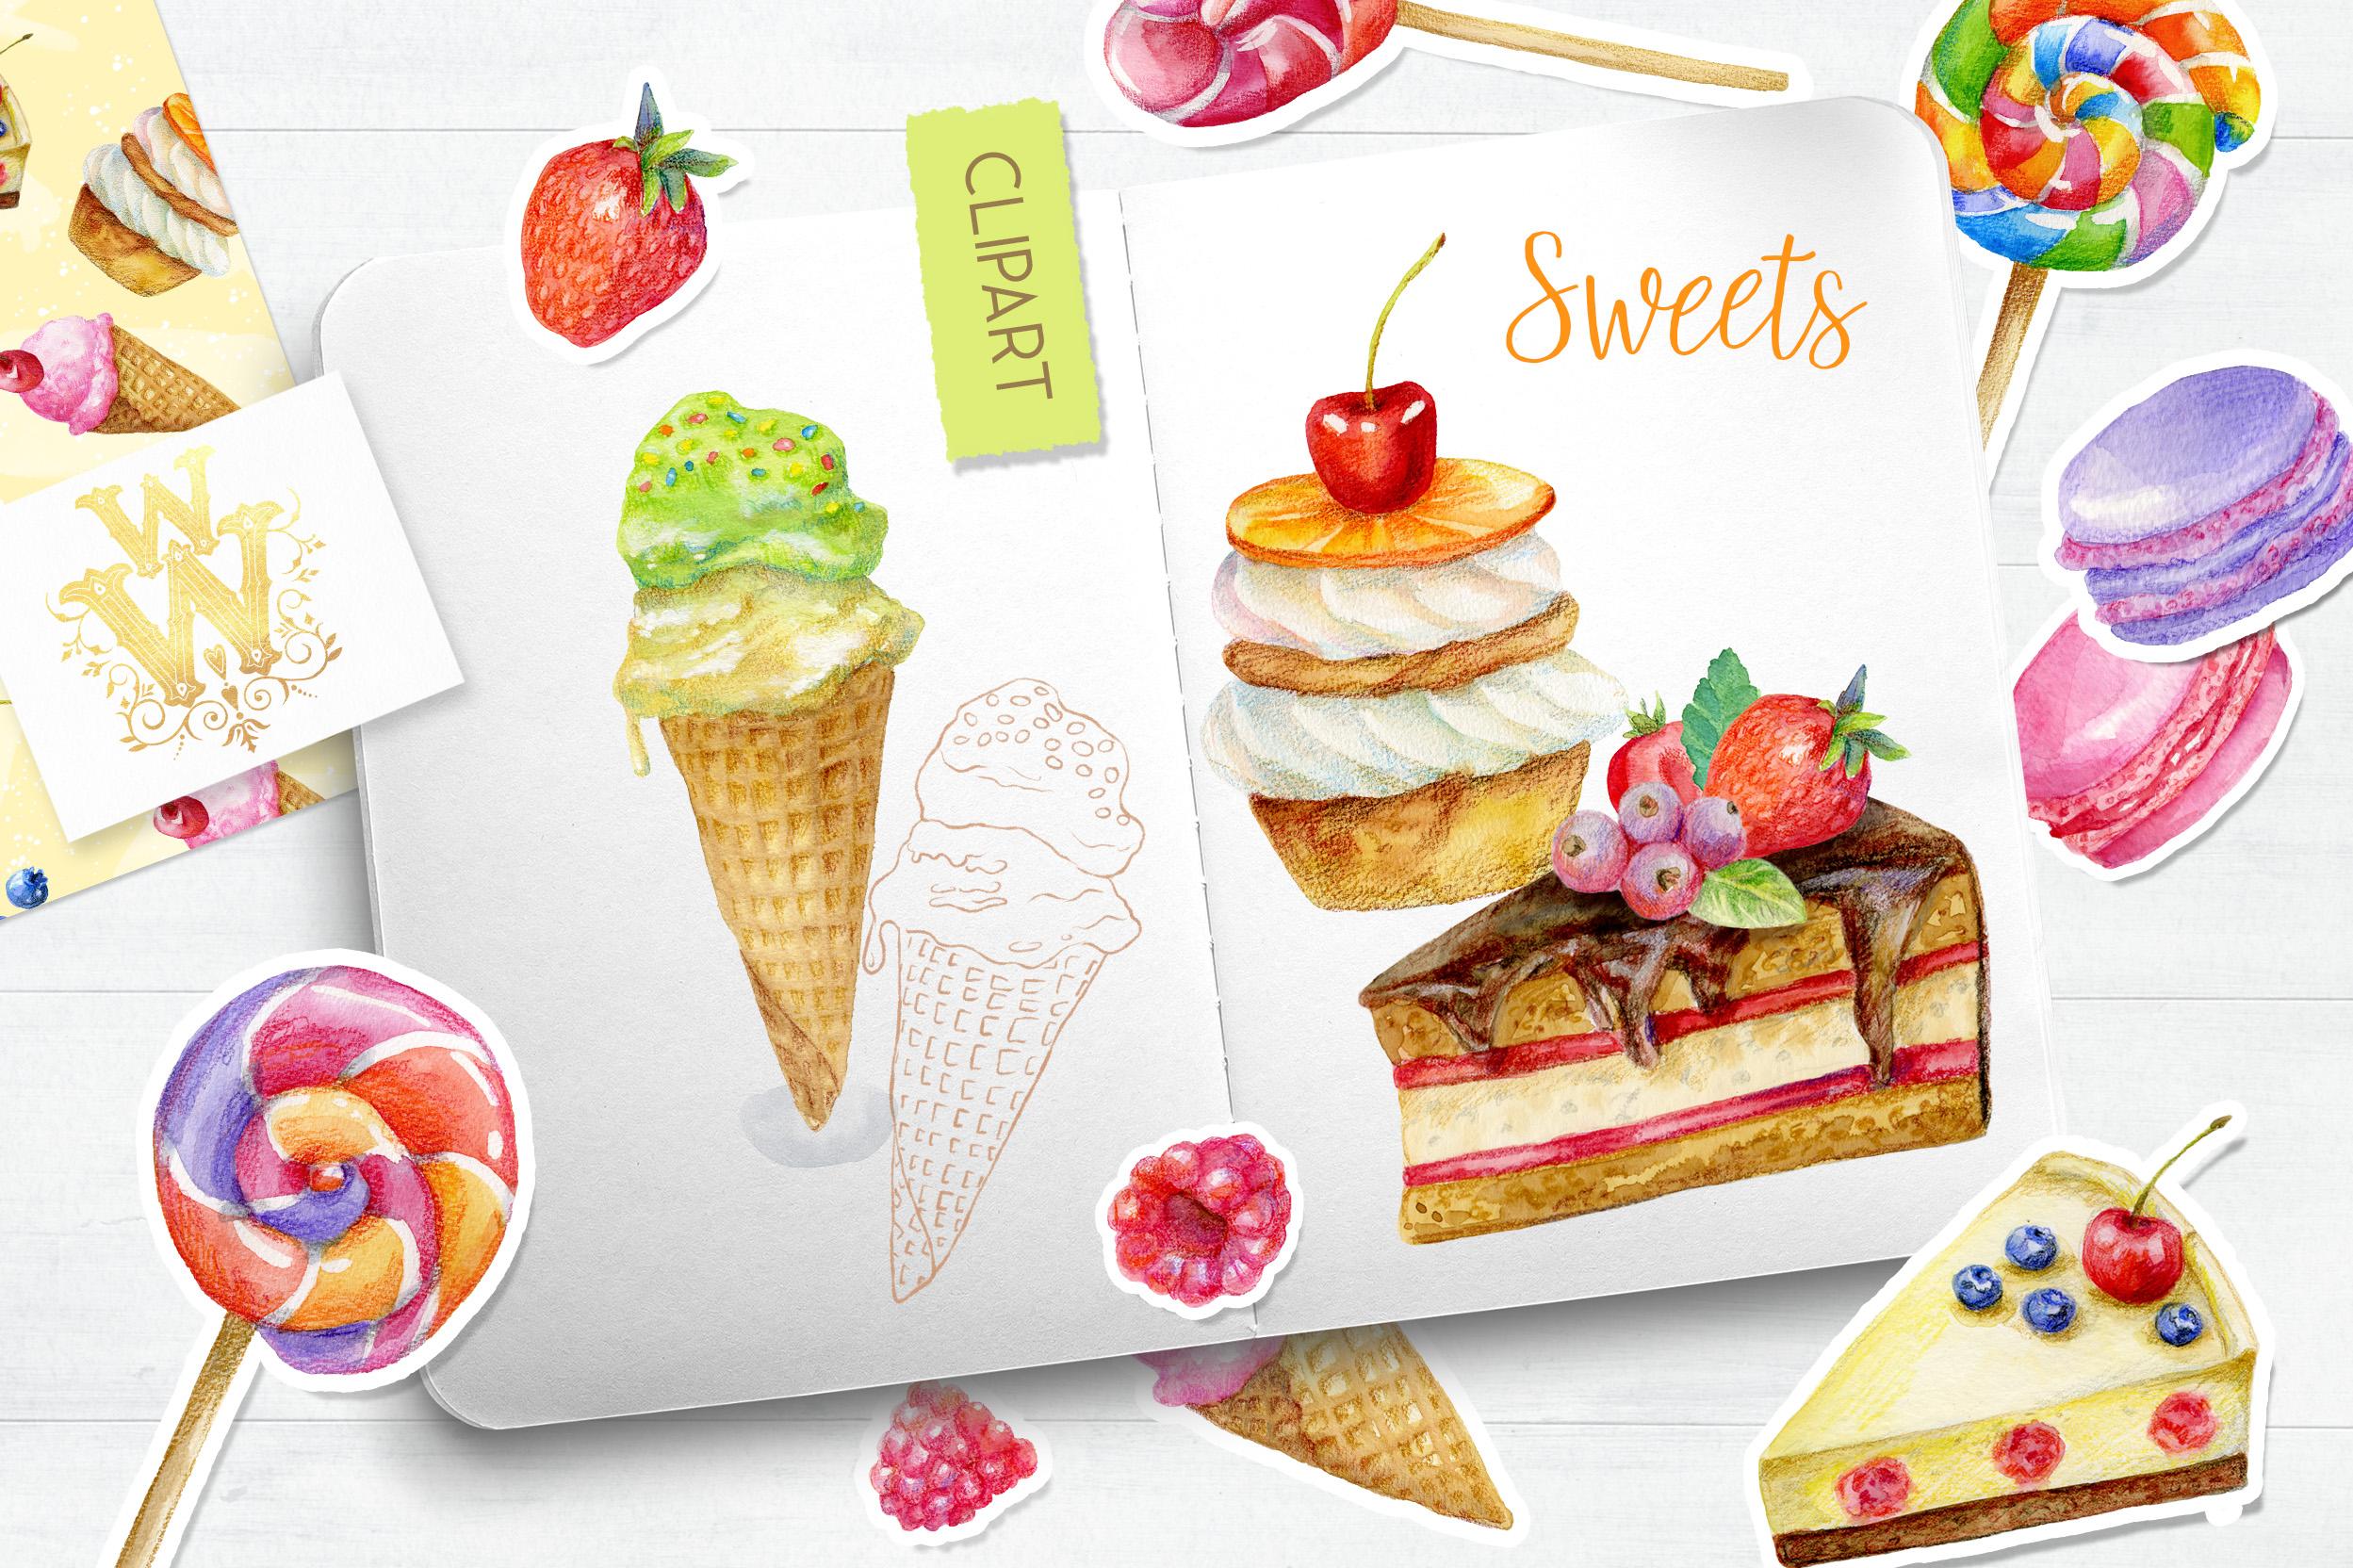 Watercolor sweets clipart, food art, candy, lollipop